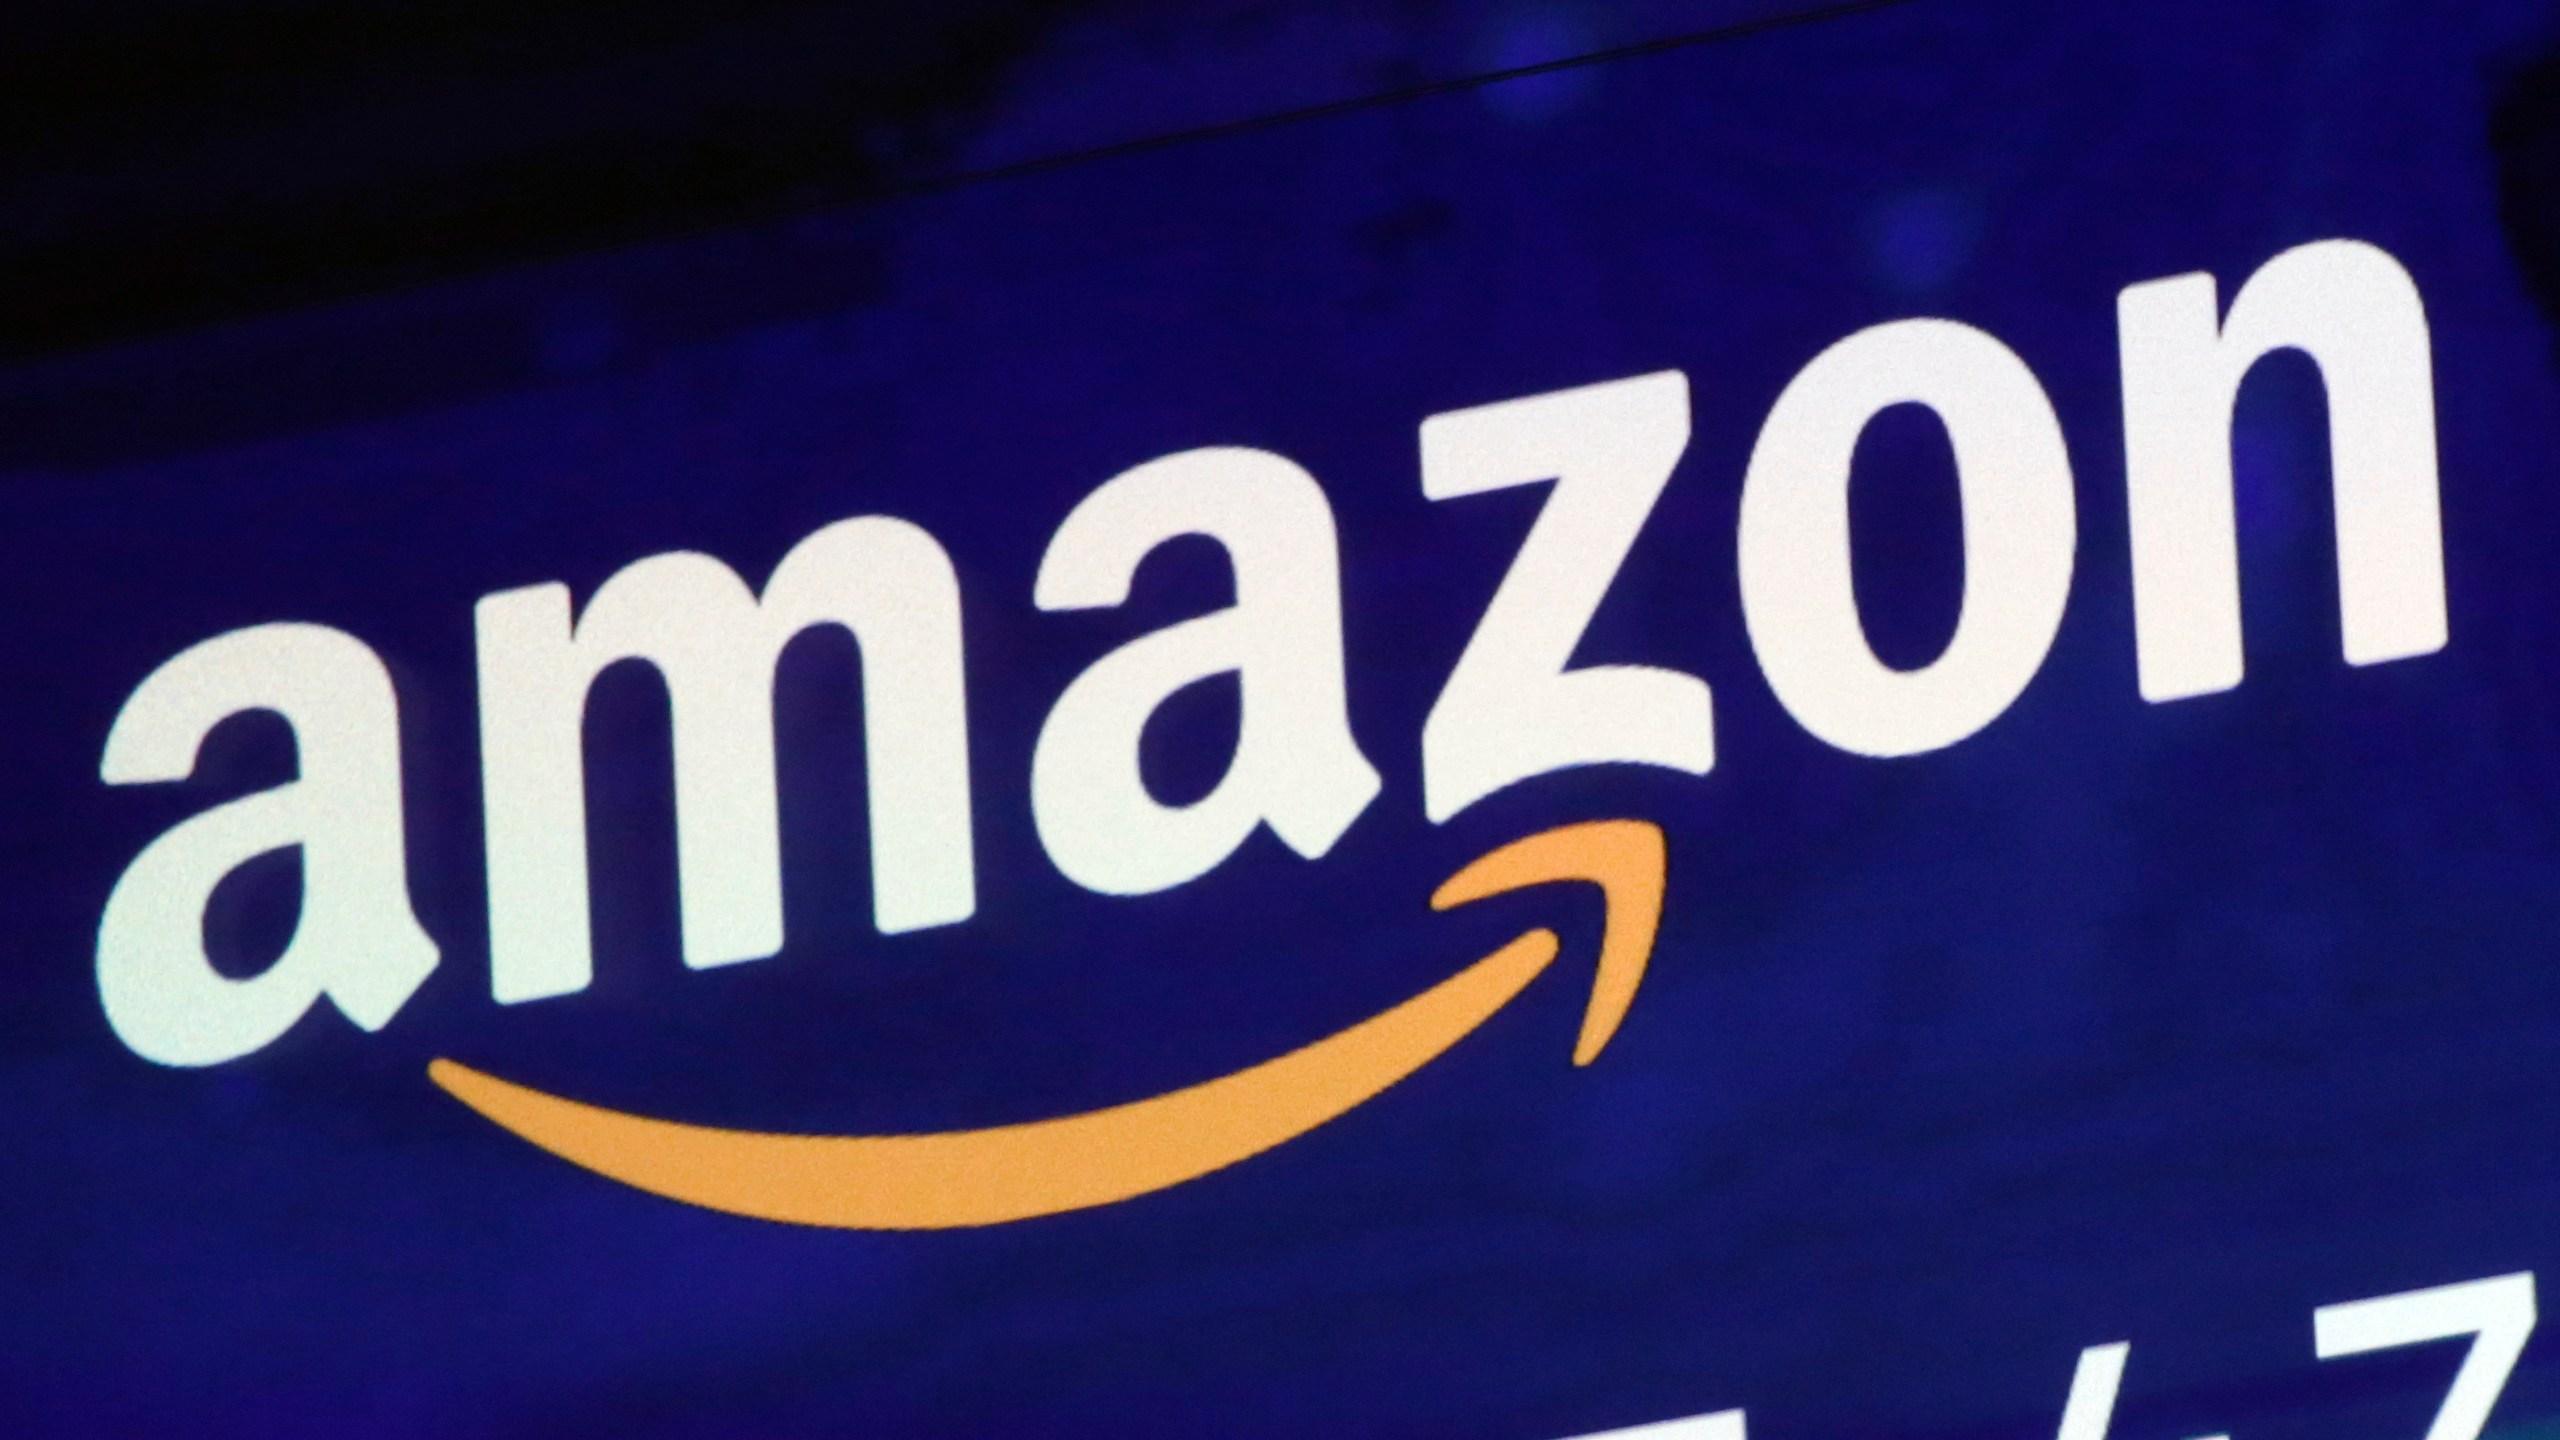 EU_Amazon_Antitrust_19453-159532.jpg11720040